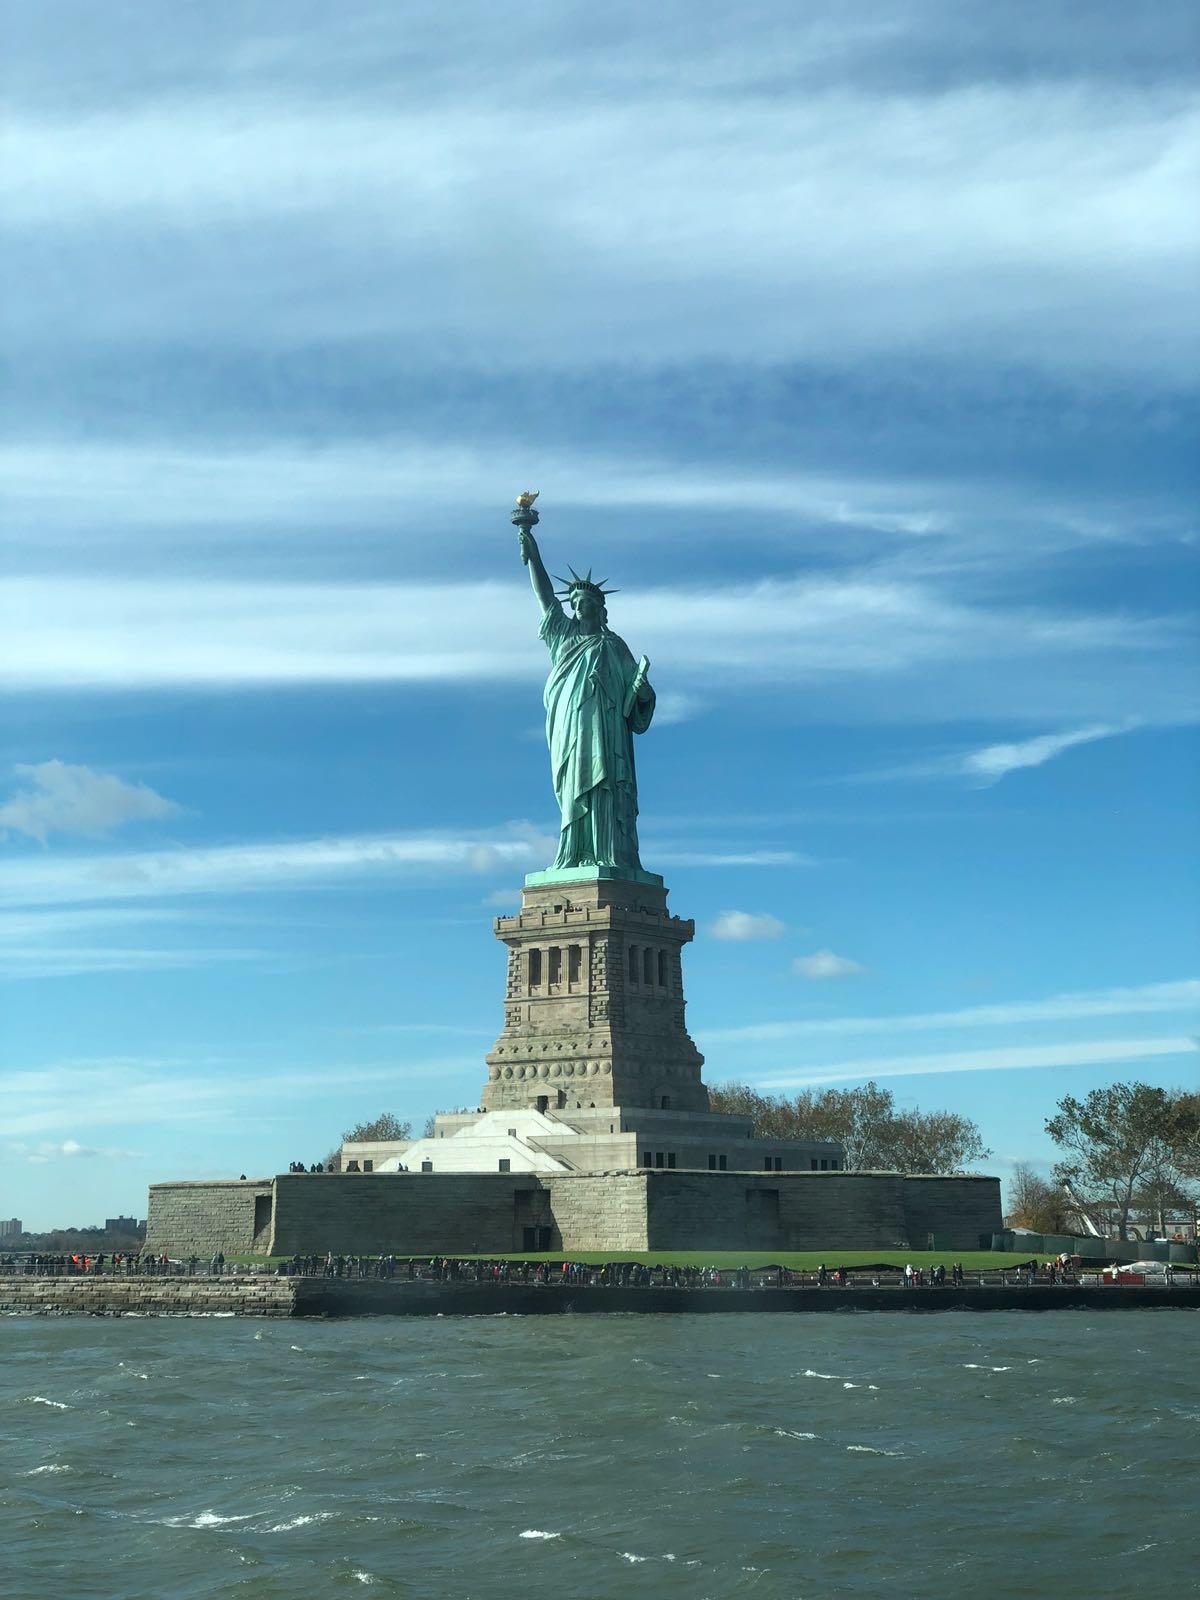 Die Statue of Liberty.